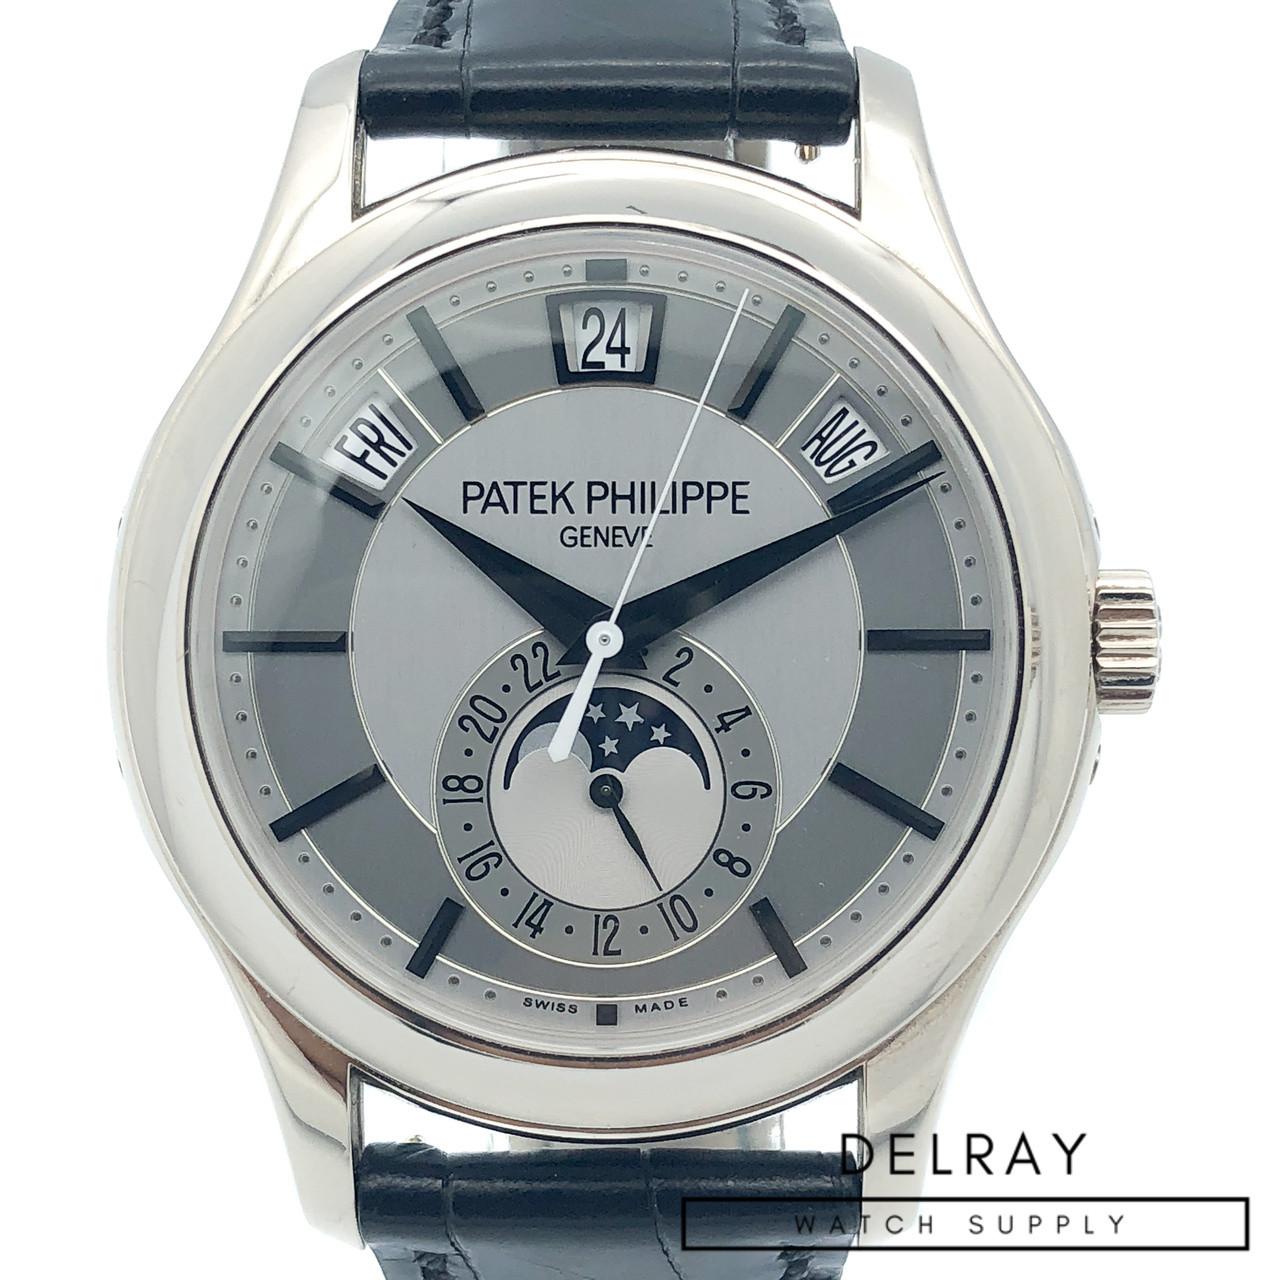 Patek Philippe Annual Calendar 5205g Delraywatch Com